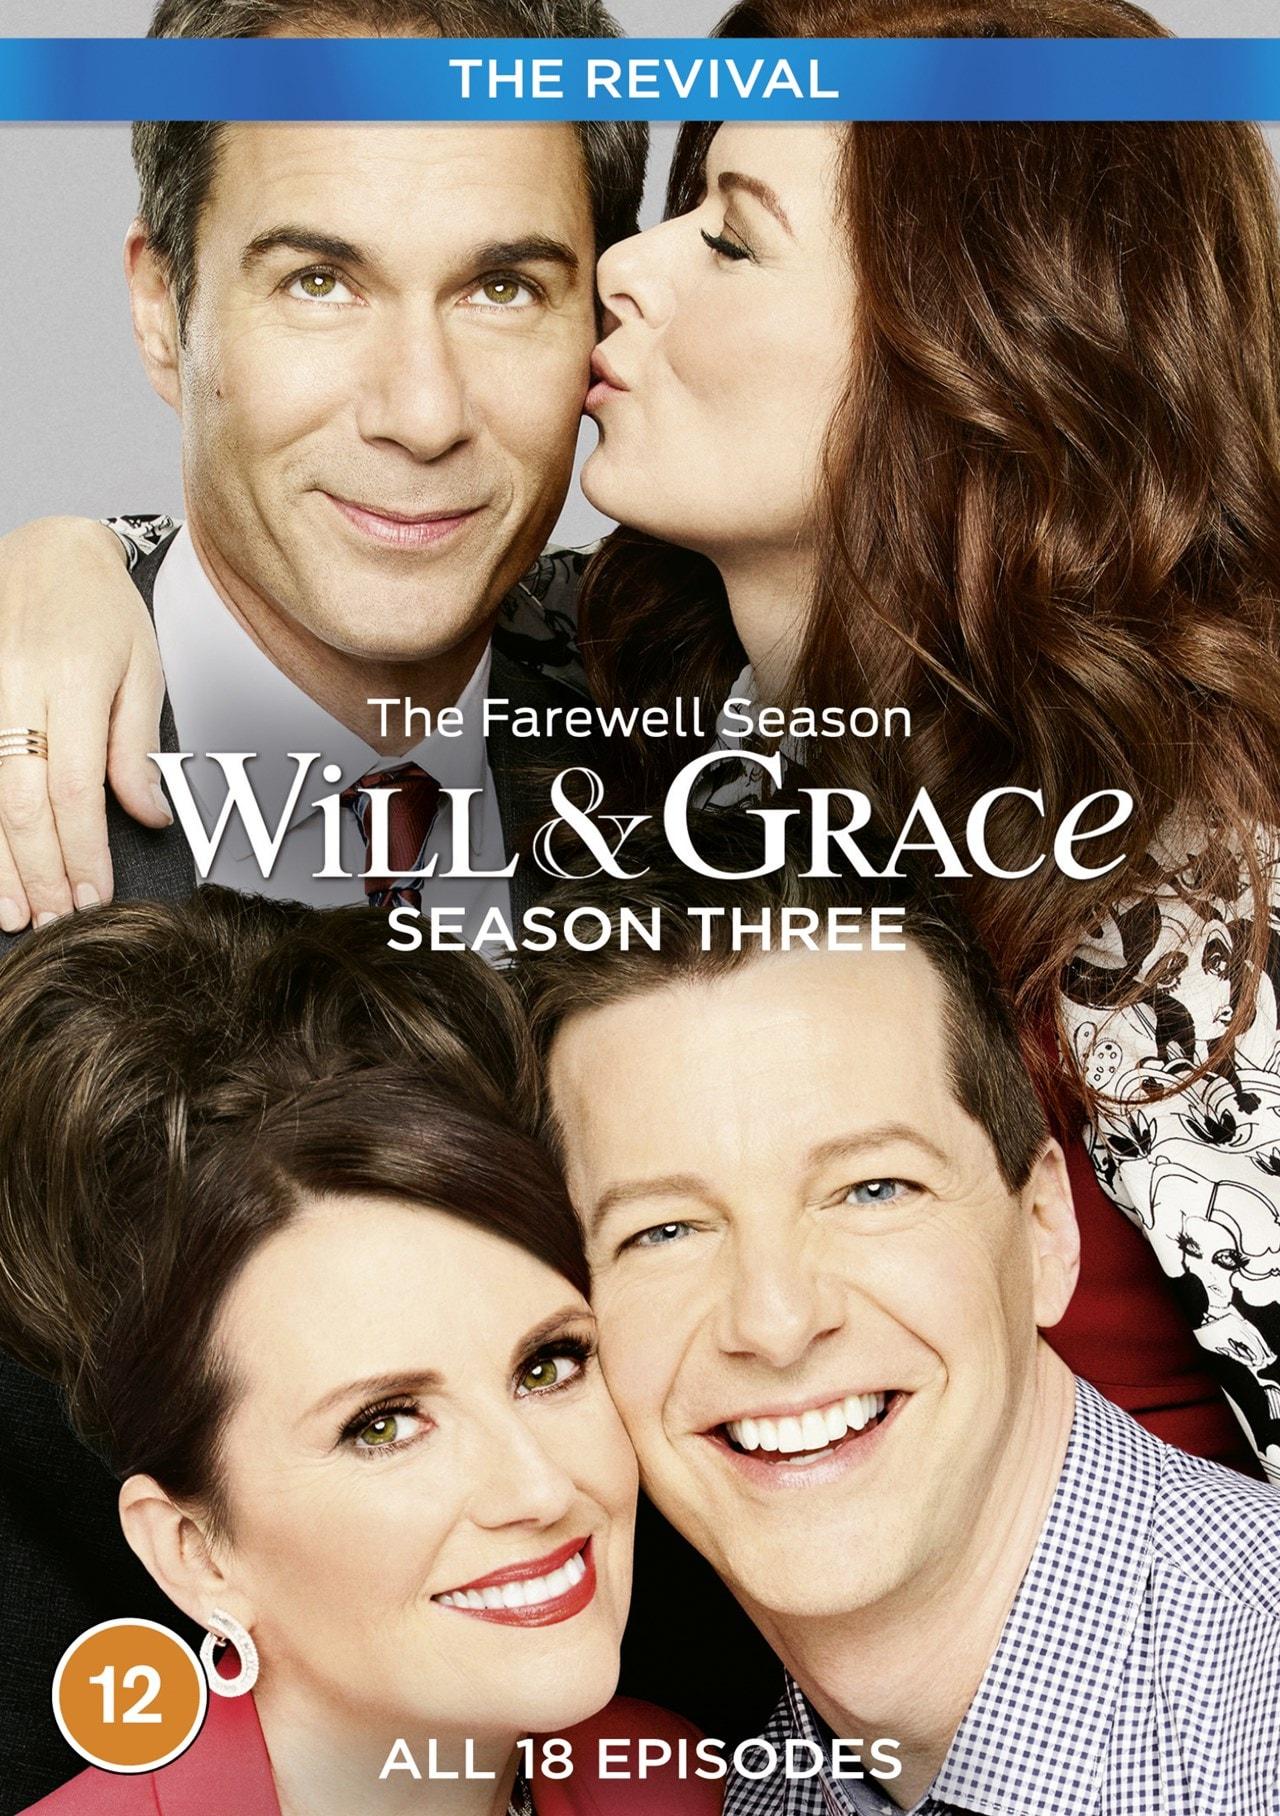 Will and Grace - The Revival: Season Three - The Farewell Season - 3